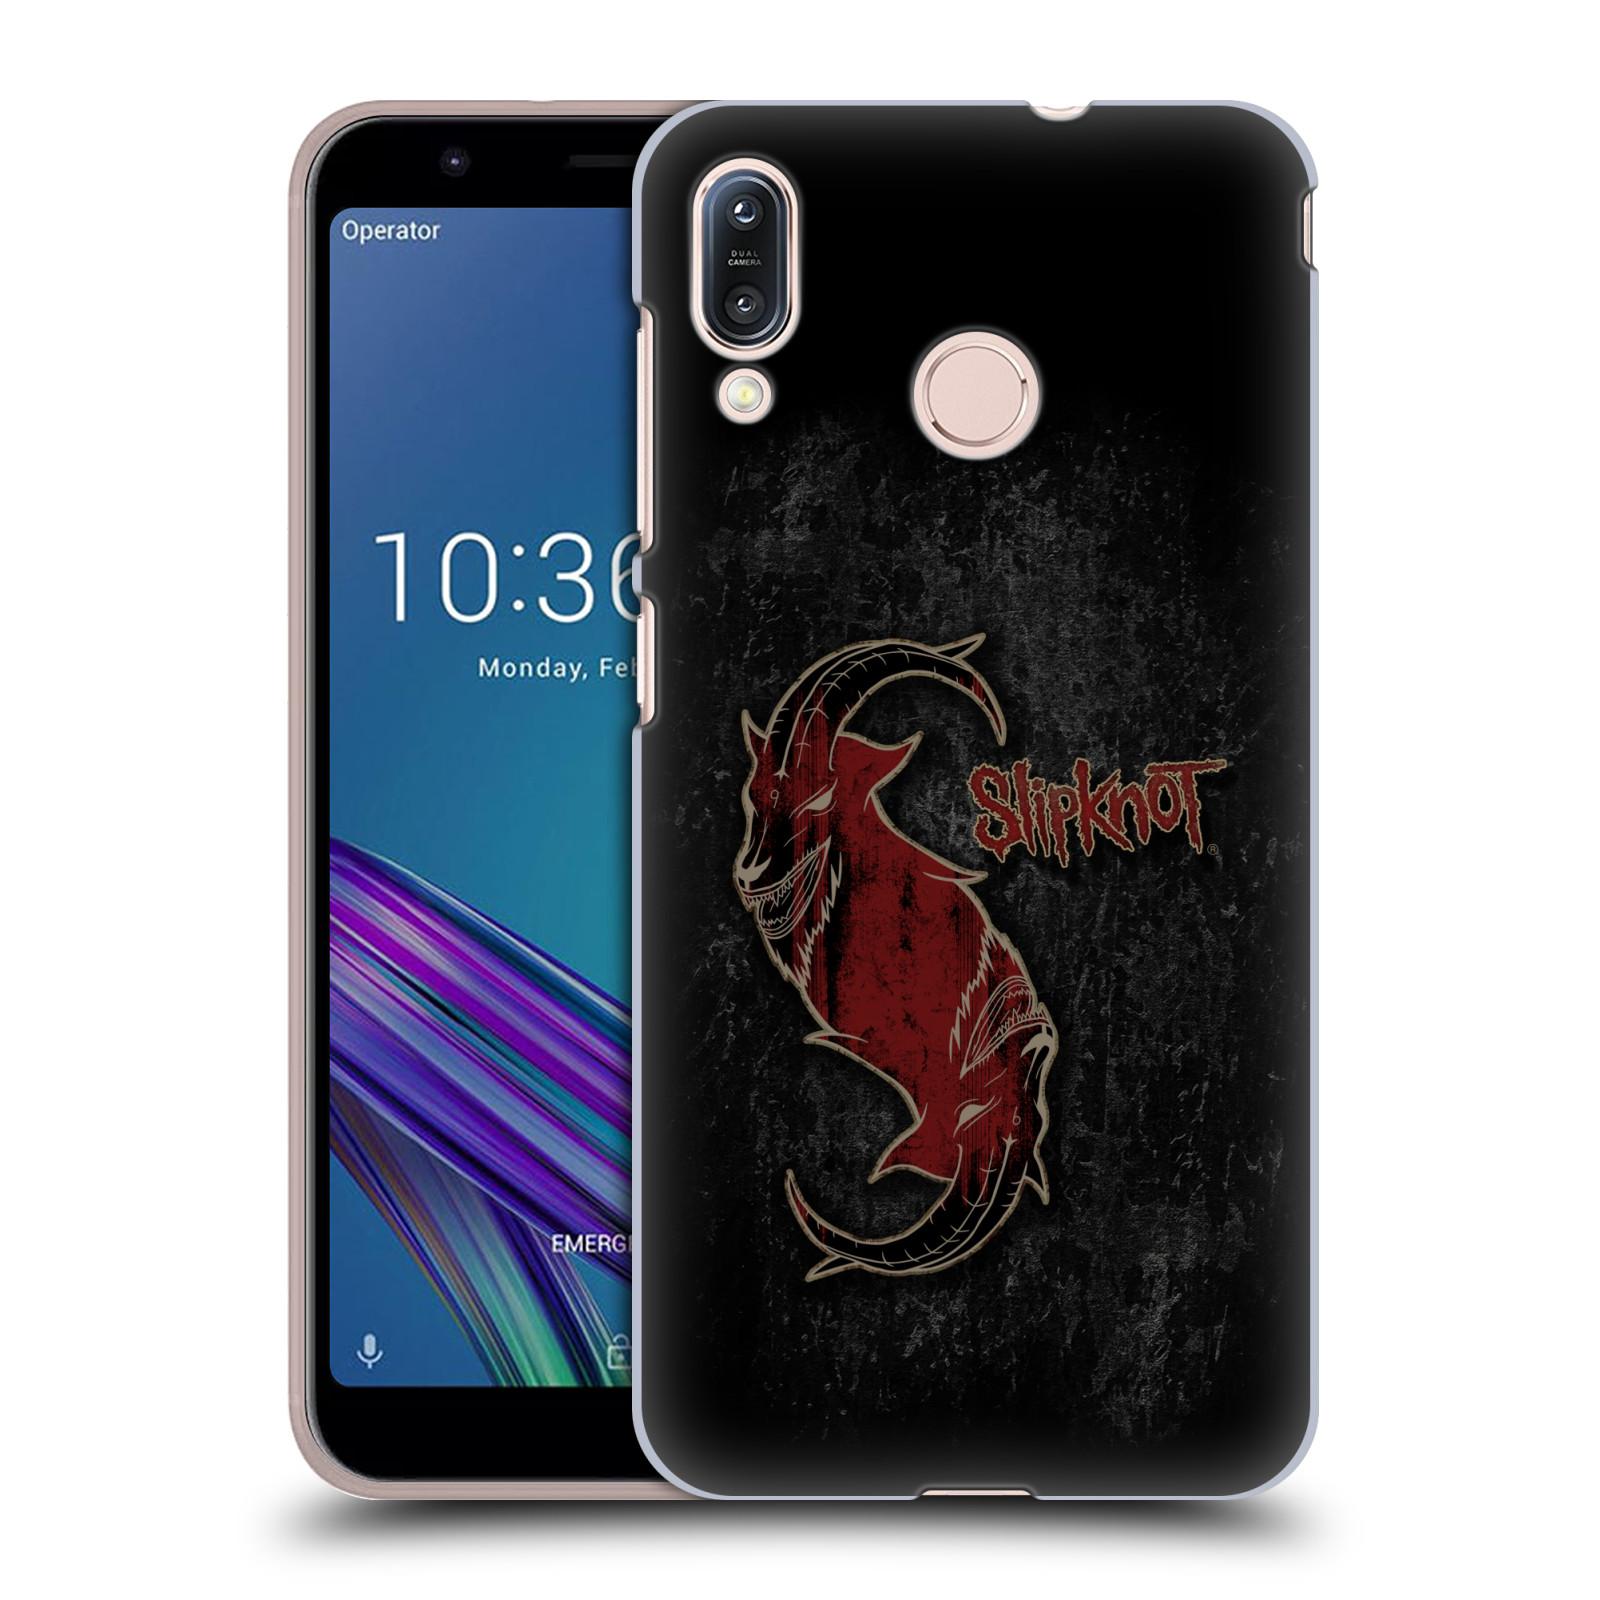 Plastové pouzdro na mobil Asus Zenfone Max M1 ZB555KL - Head Case - Slipknot - Rudý kozel